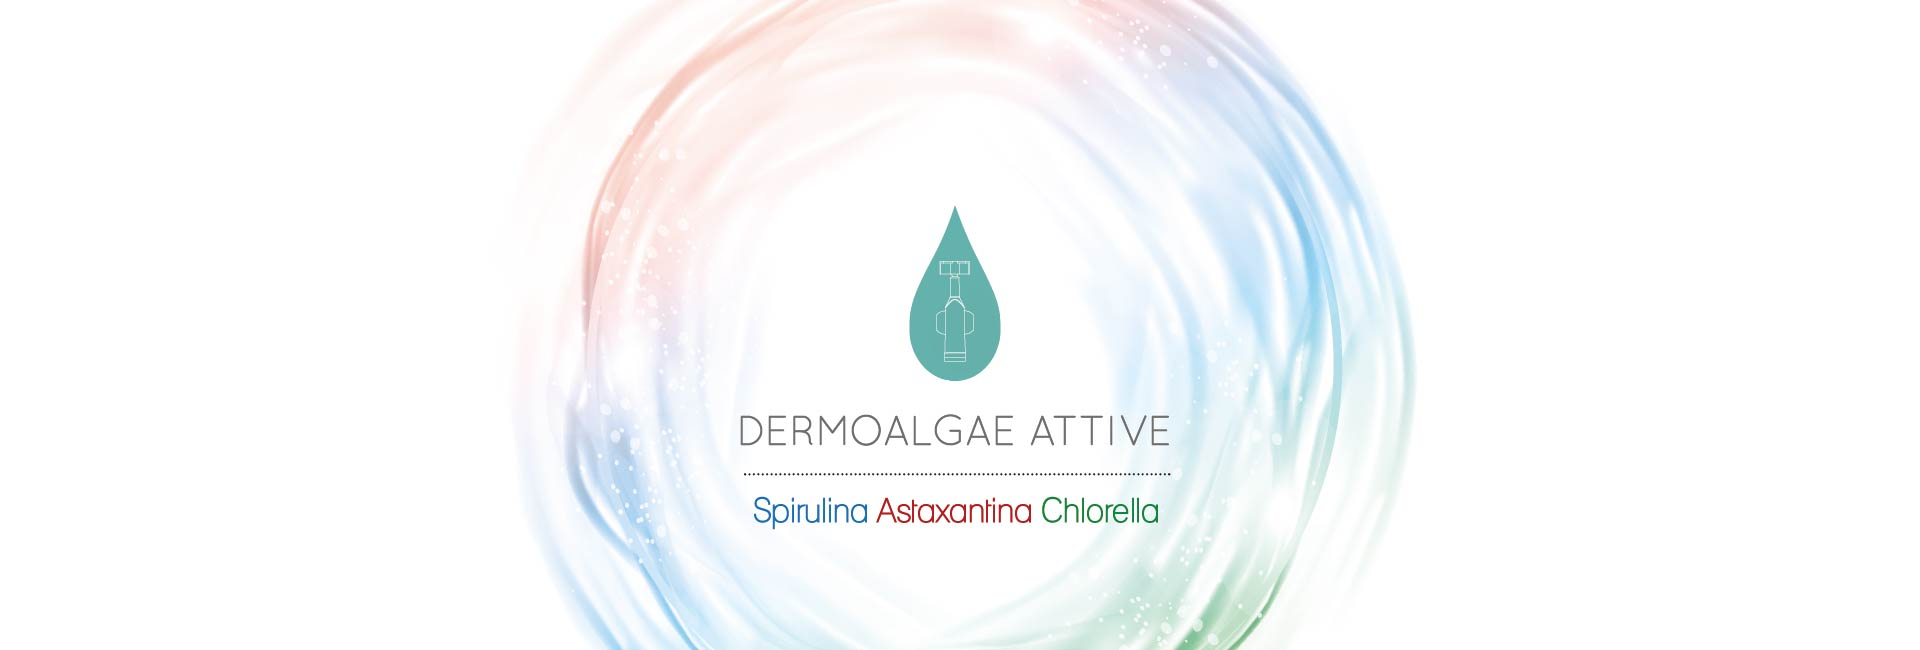 dermoalgae-_bellezza_viso-02